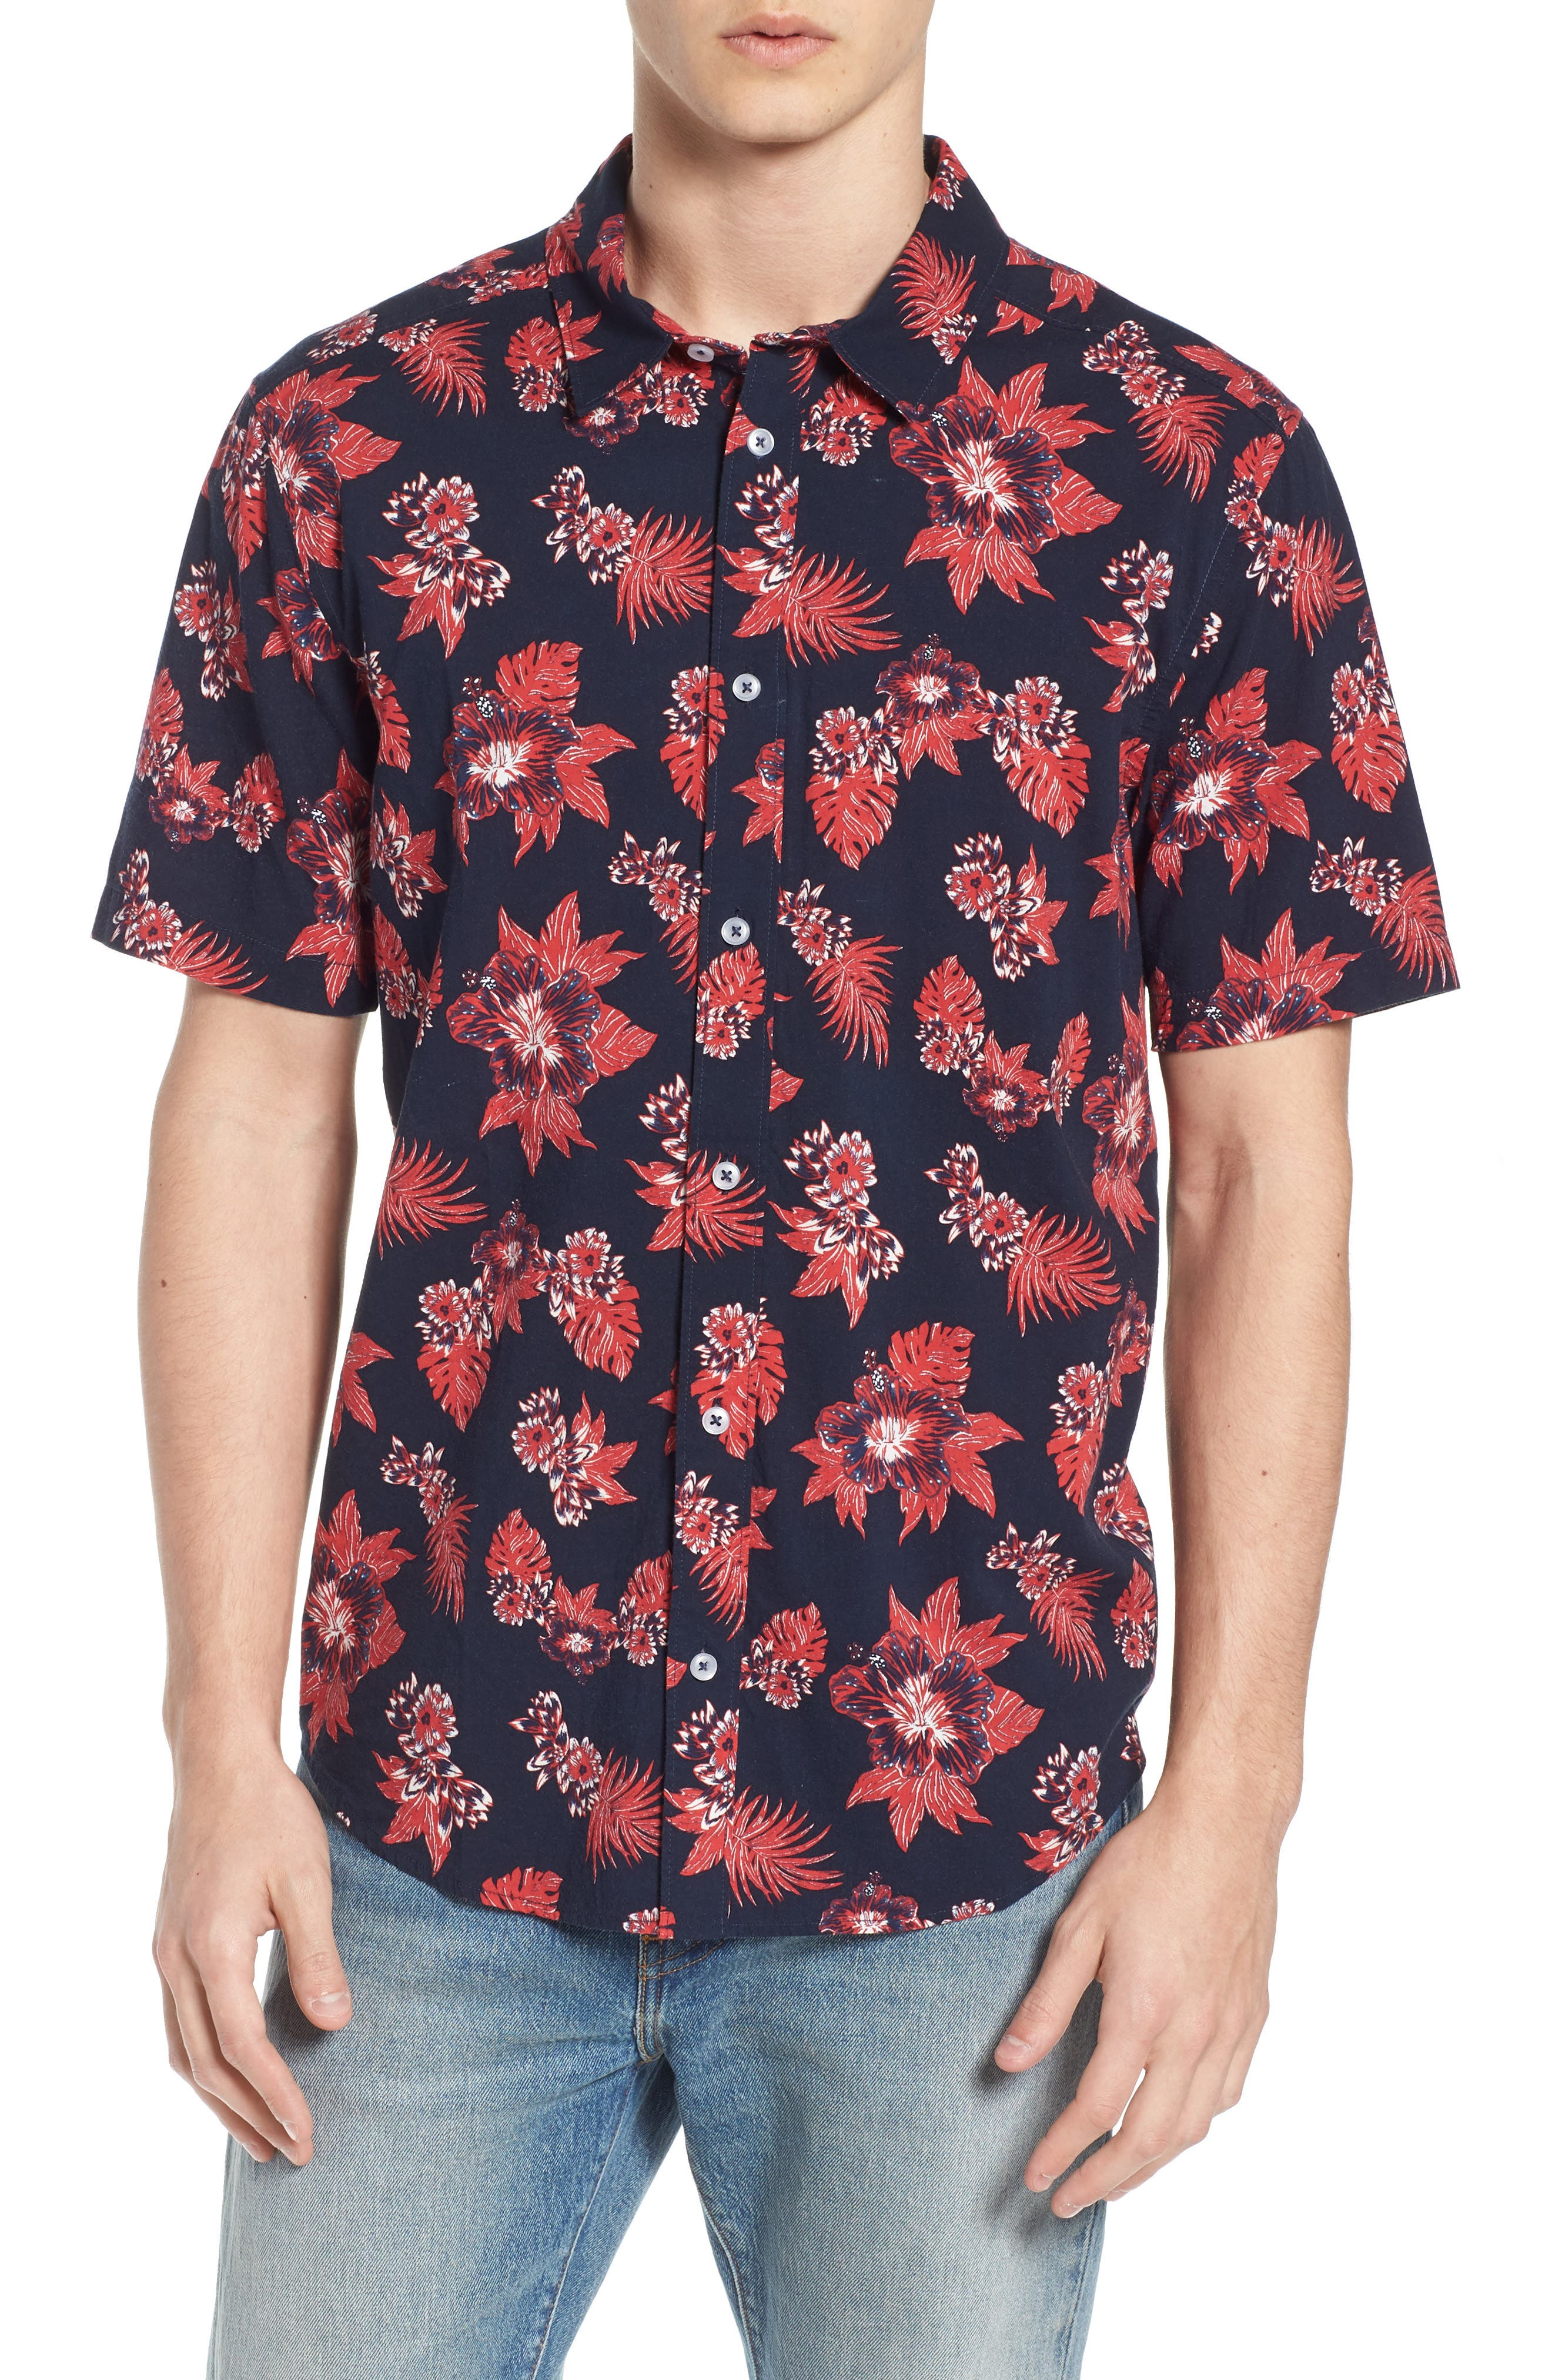 McMillian Woven Shirt,                         Main,                         color, 402